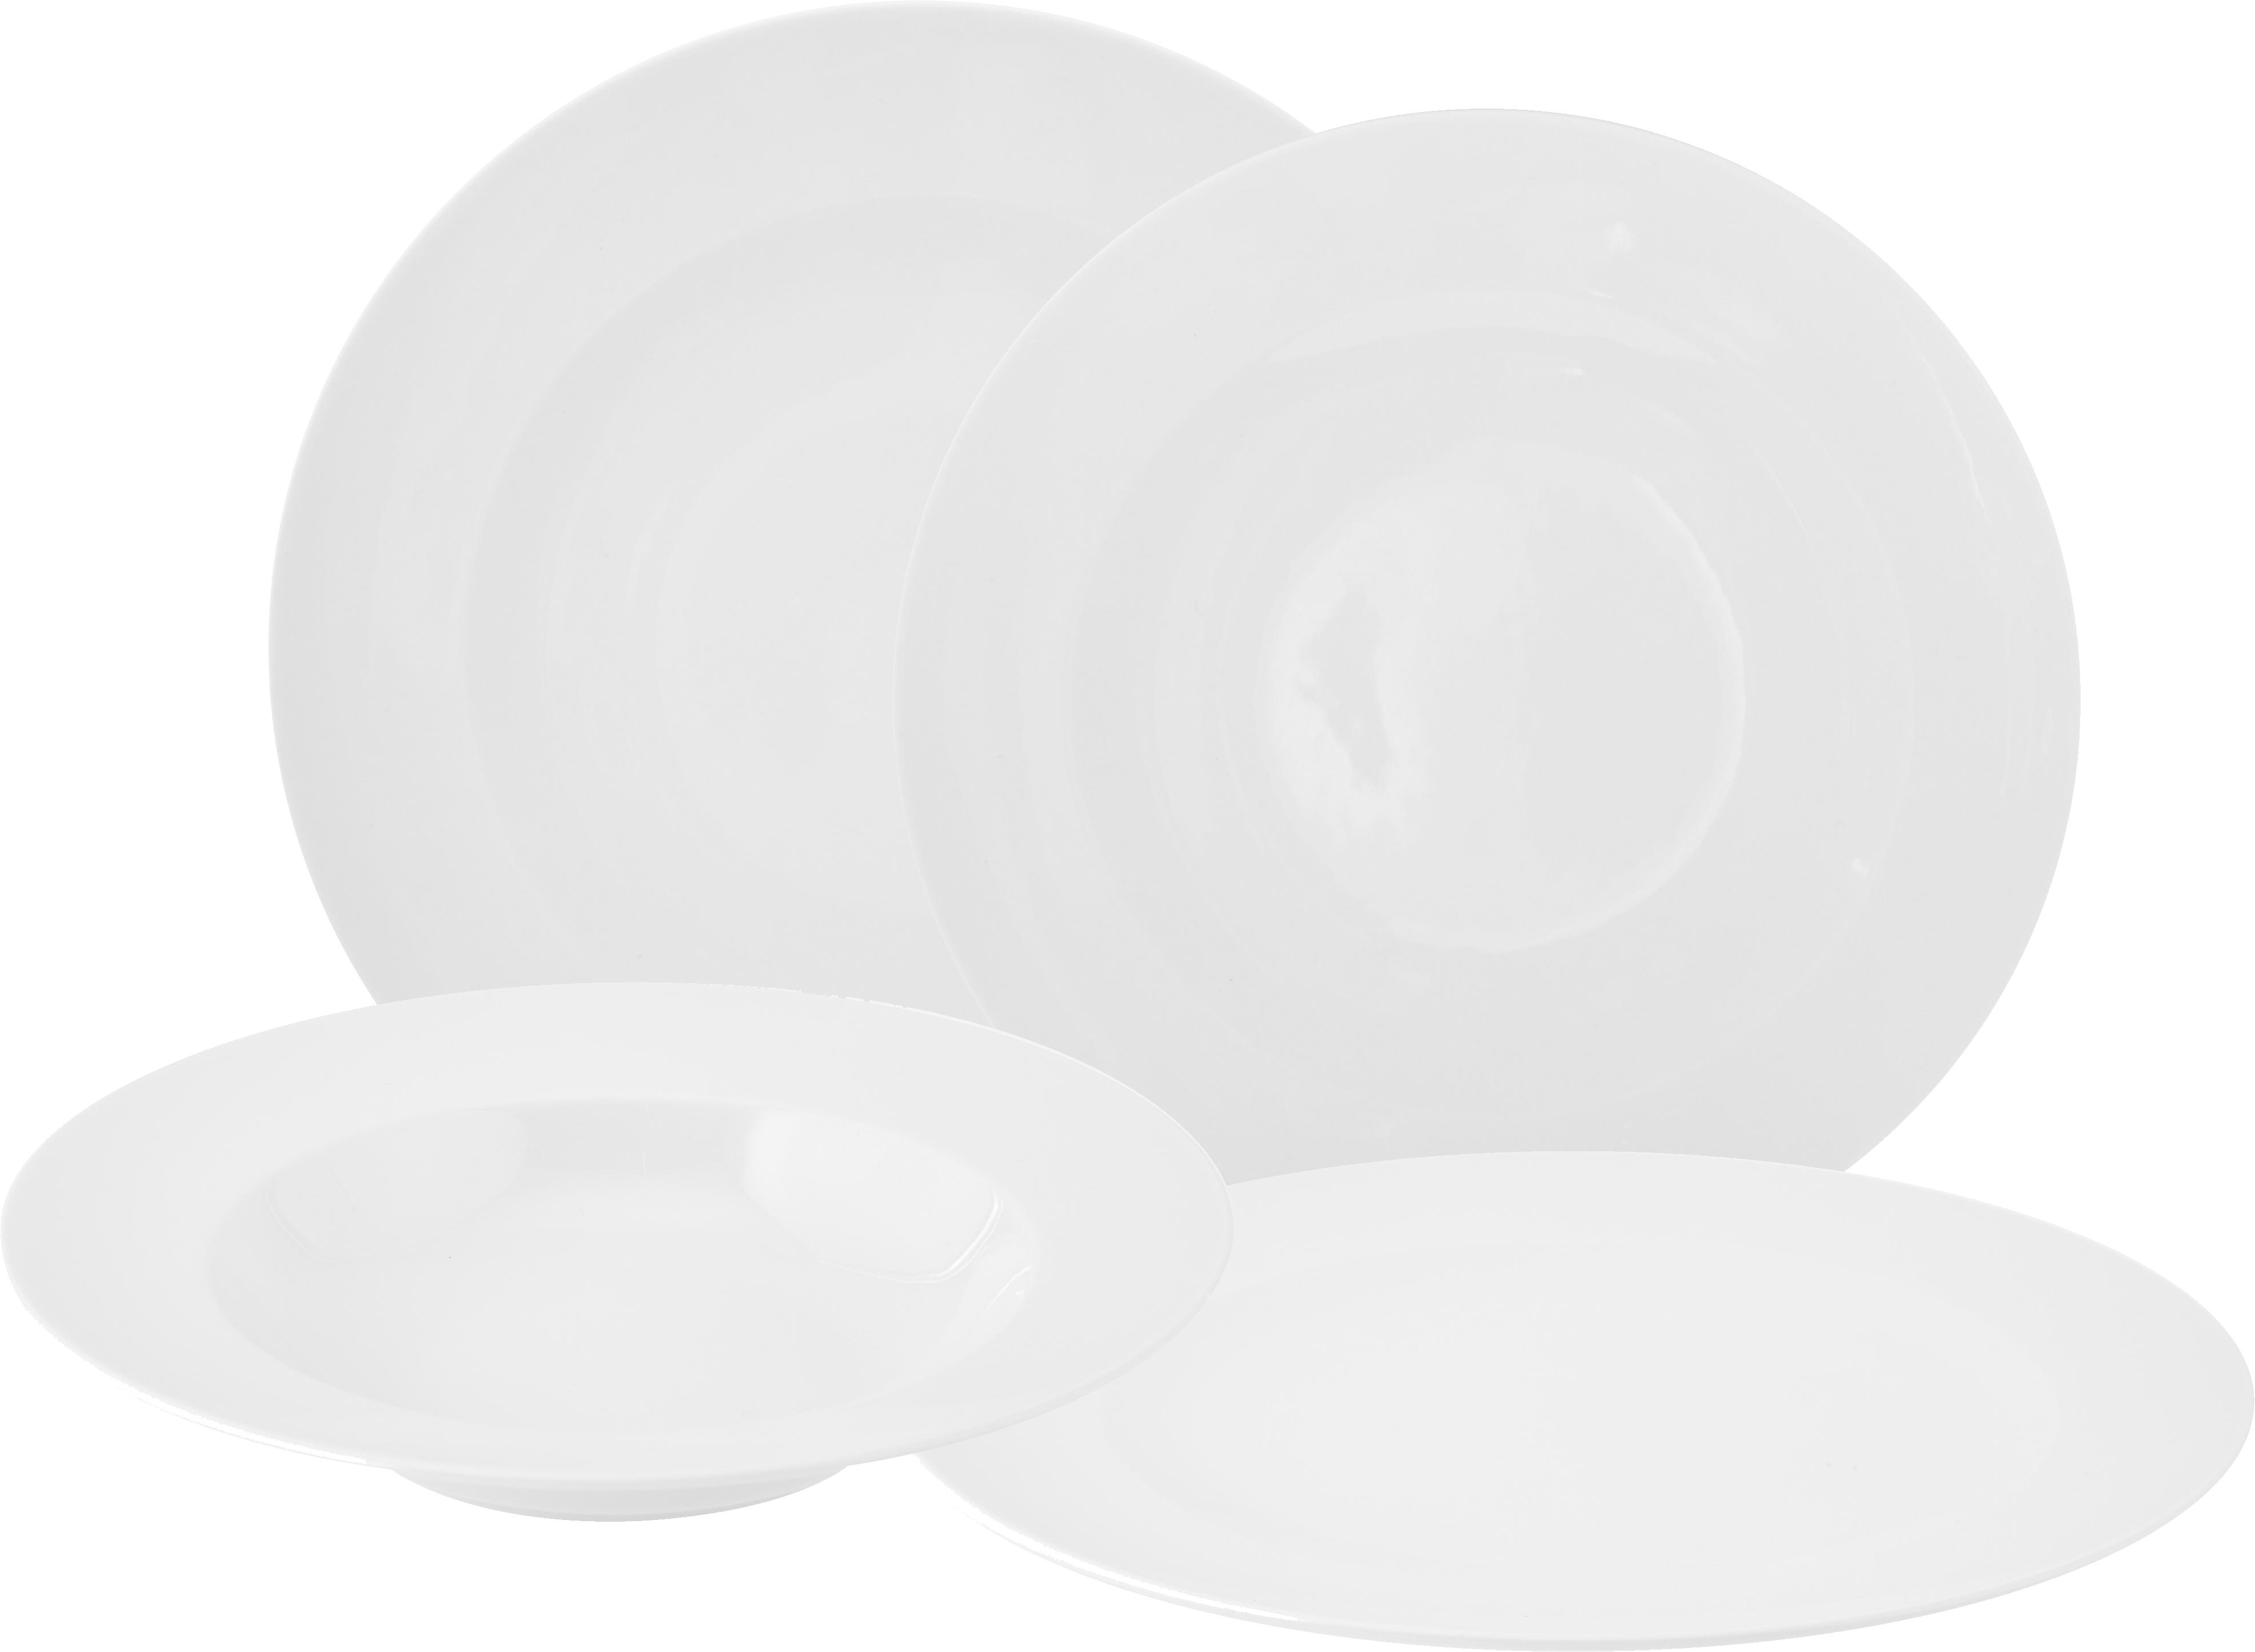 Vajila de porcelan For Me, 6comensales (8pzas.), Porcelana, Blanco, Tamaños diferentes